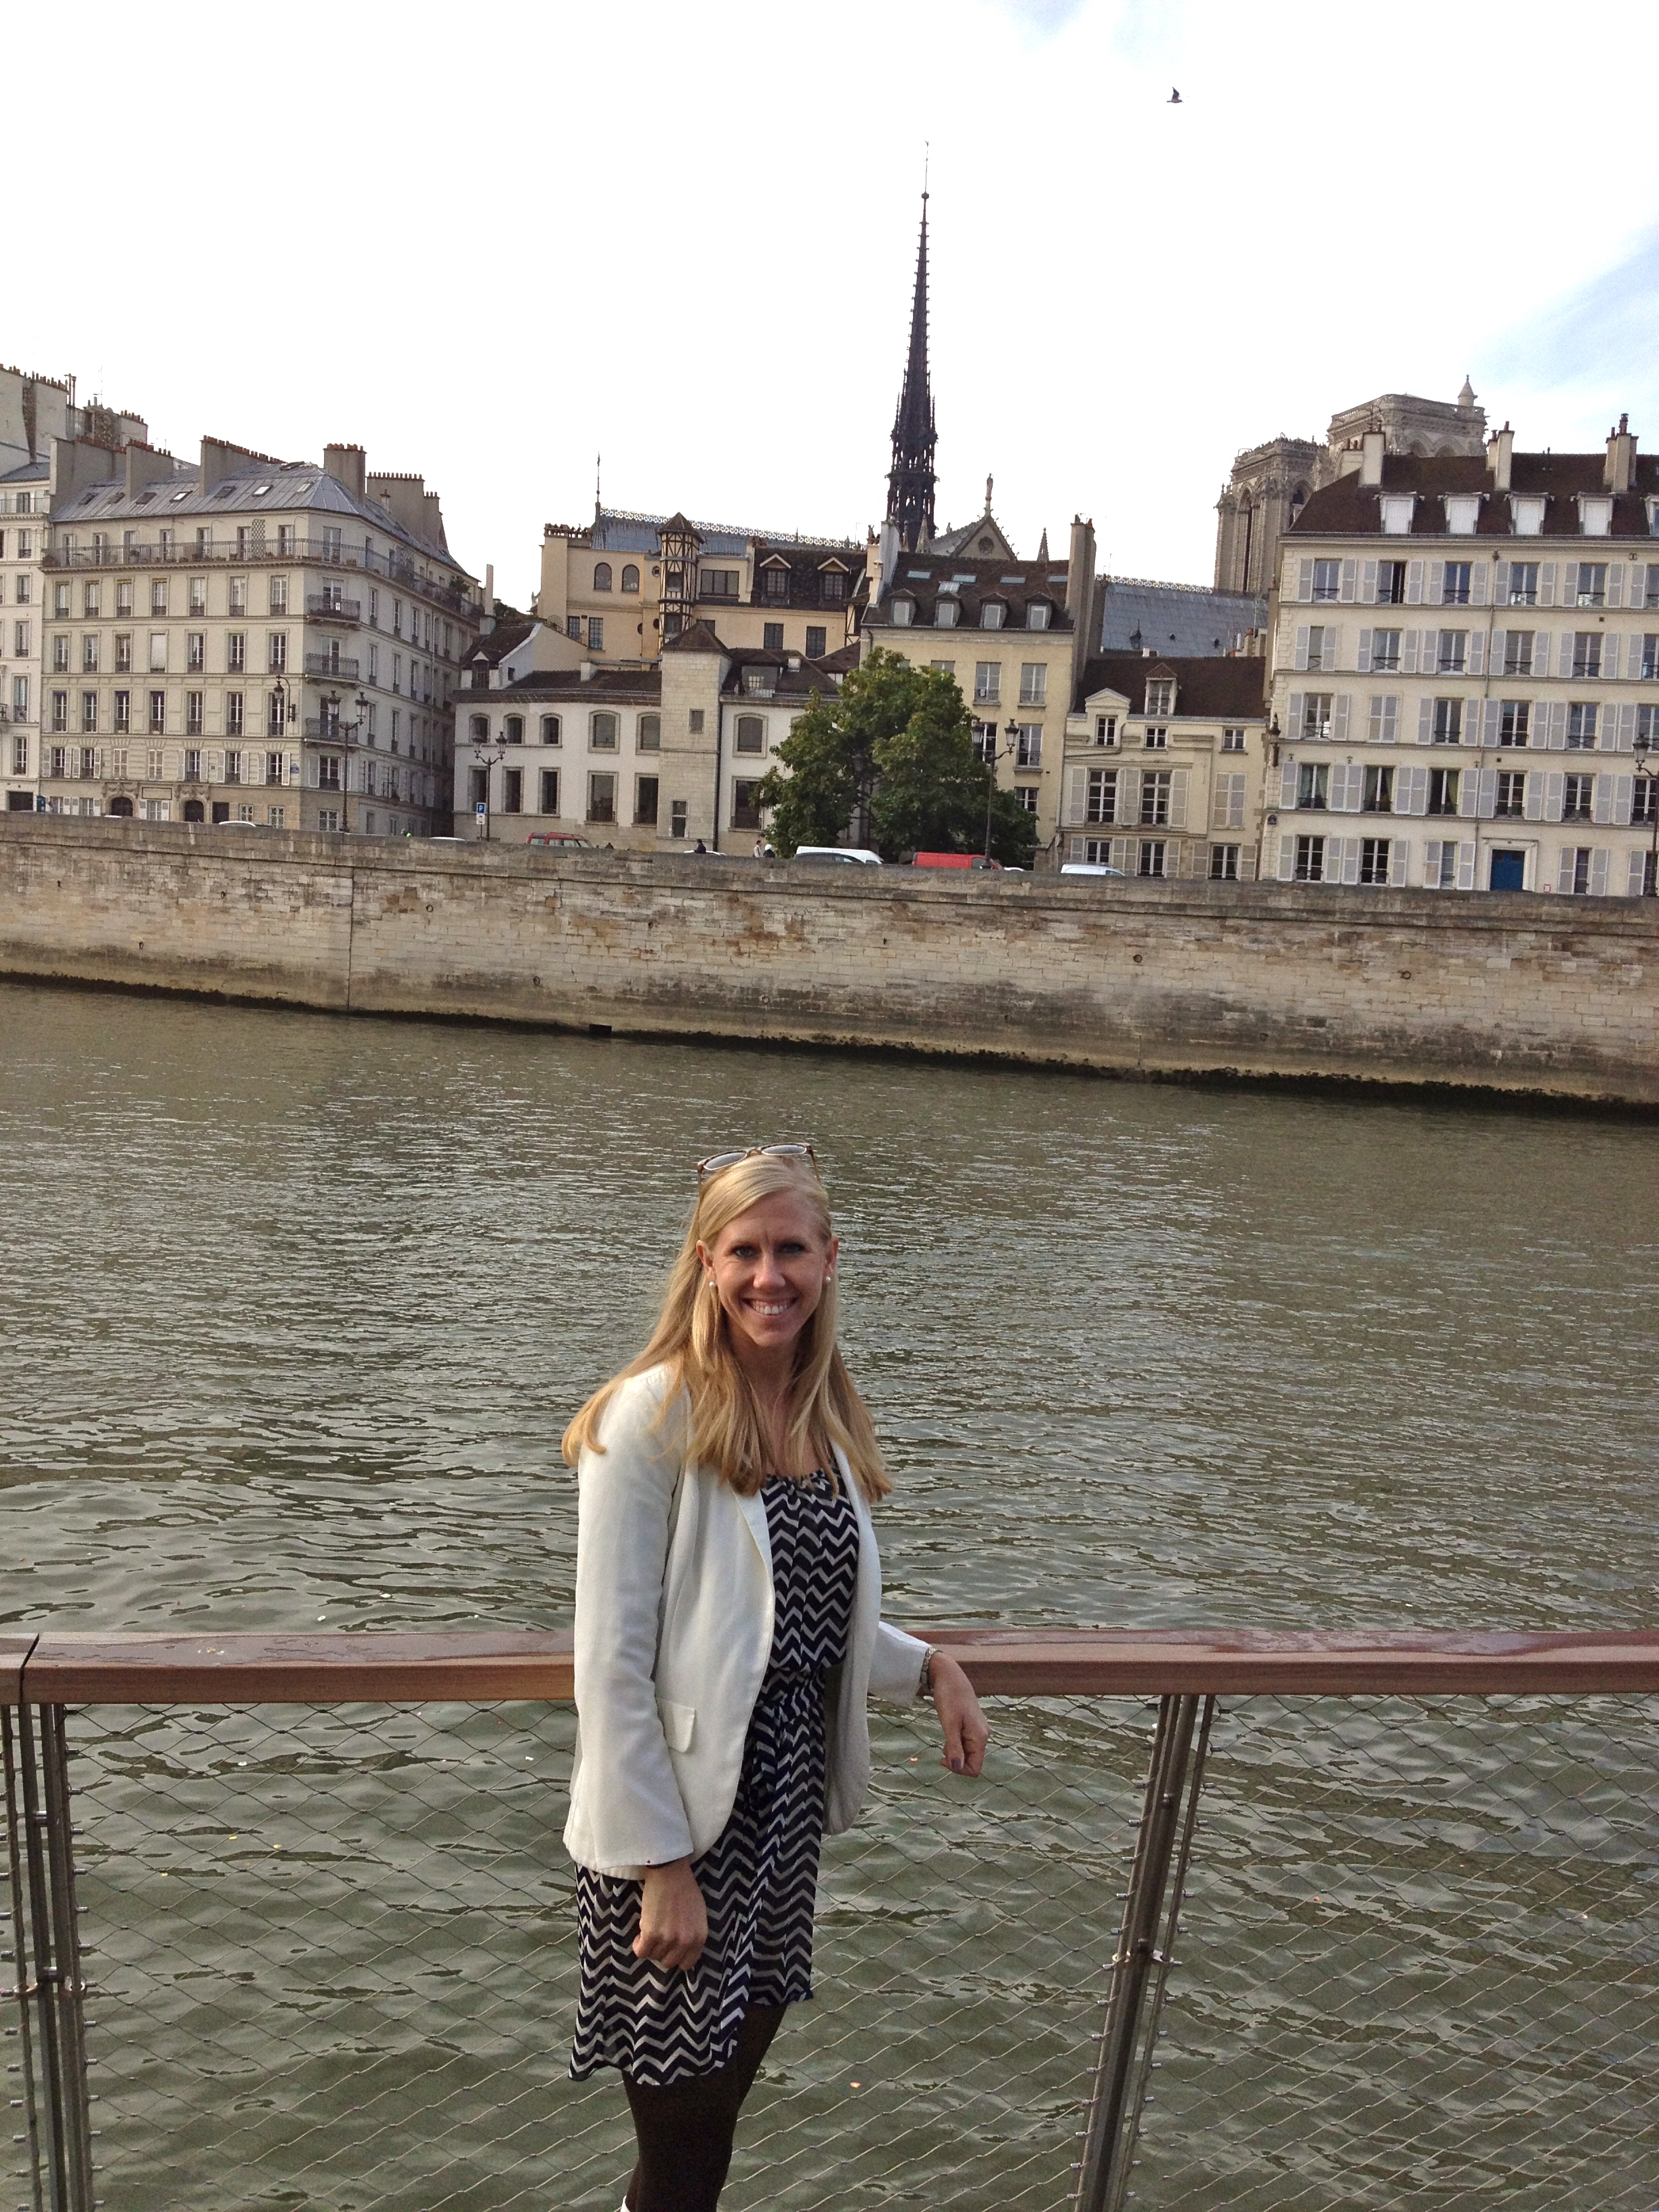 River cruise along the Seine